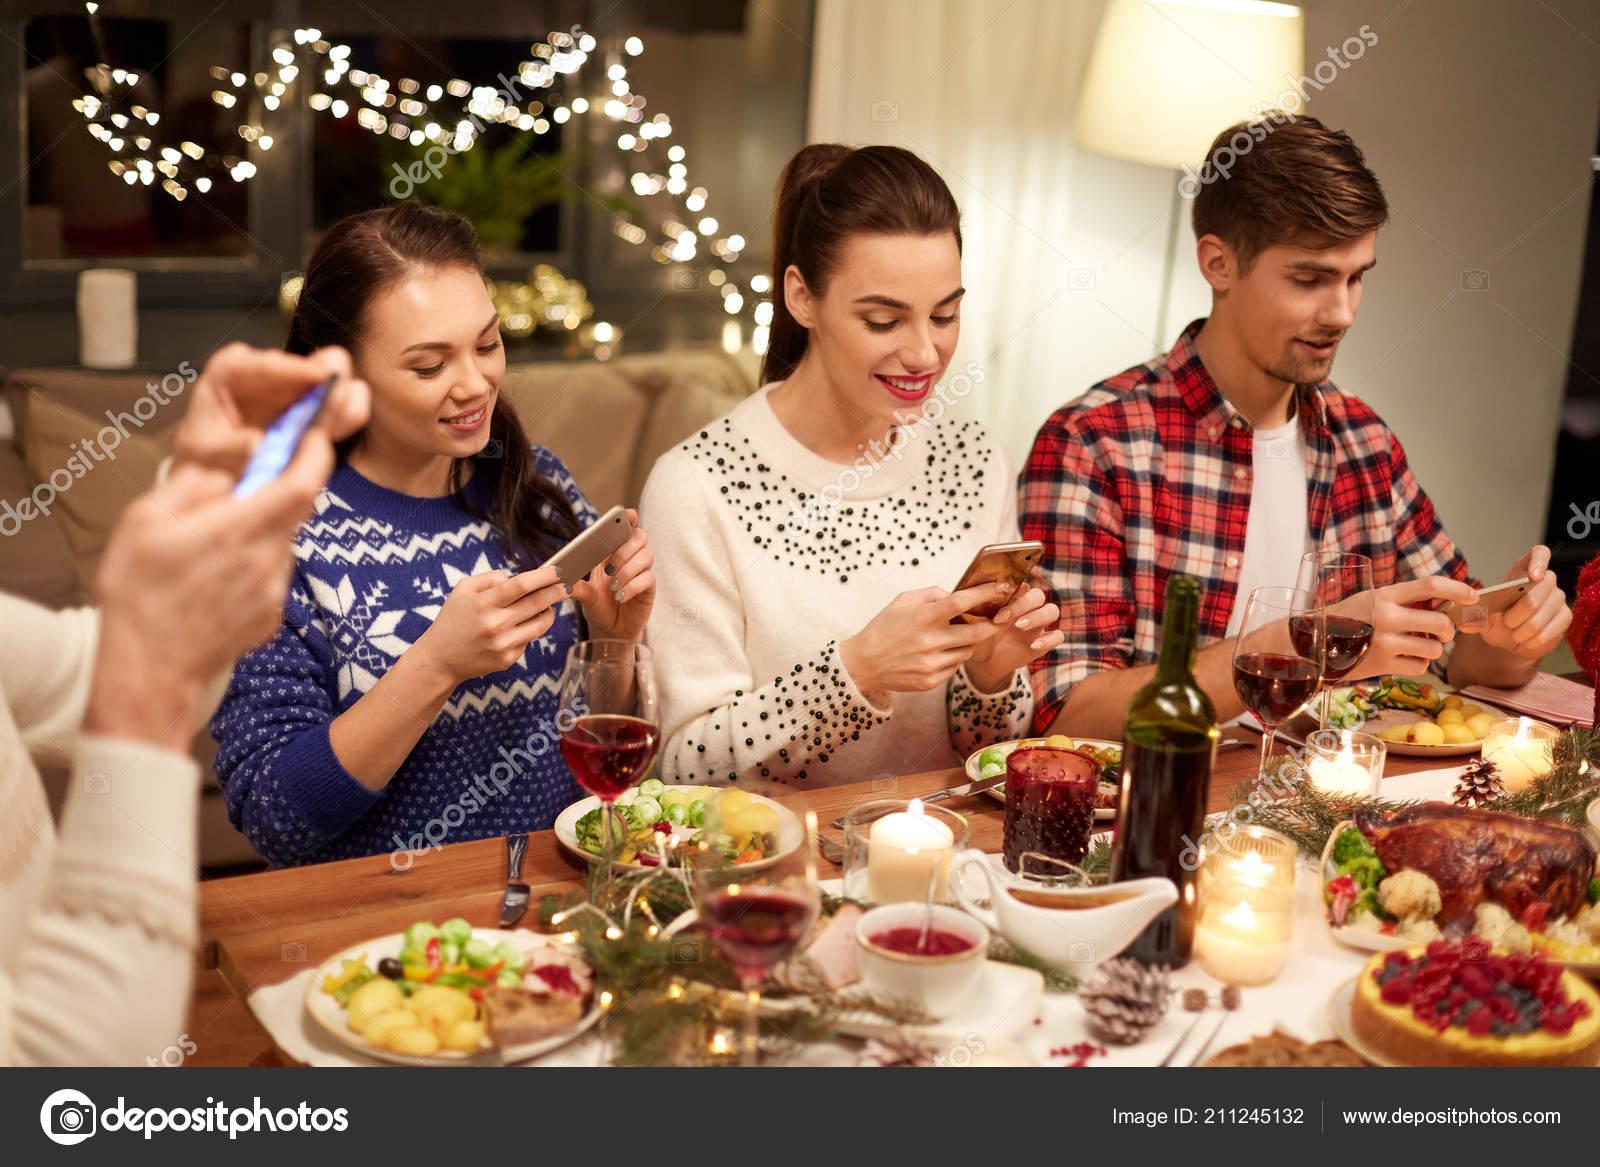 Fotos Cena Navidad Frinsa.Friends With Smartphones Having Christmas Dinner Stock